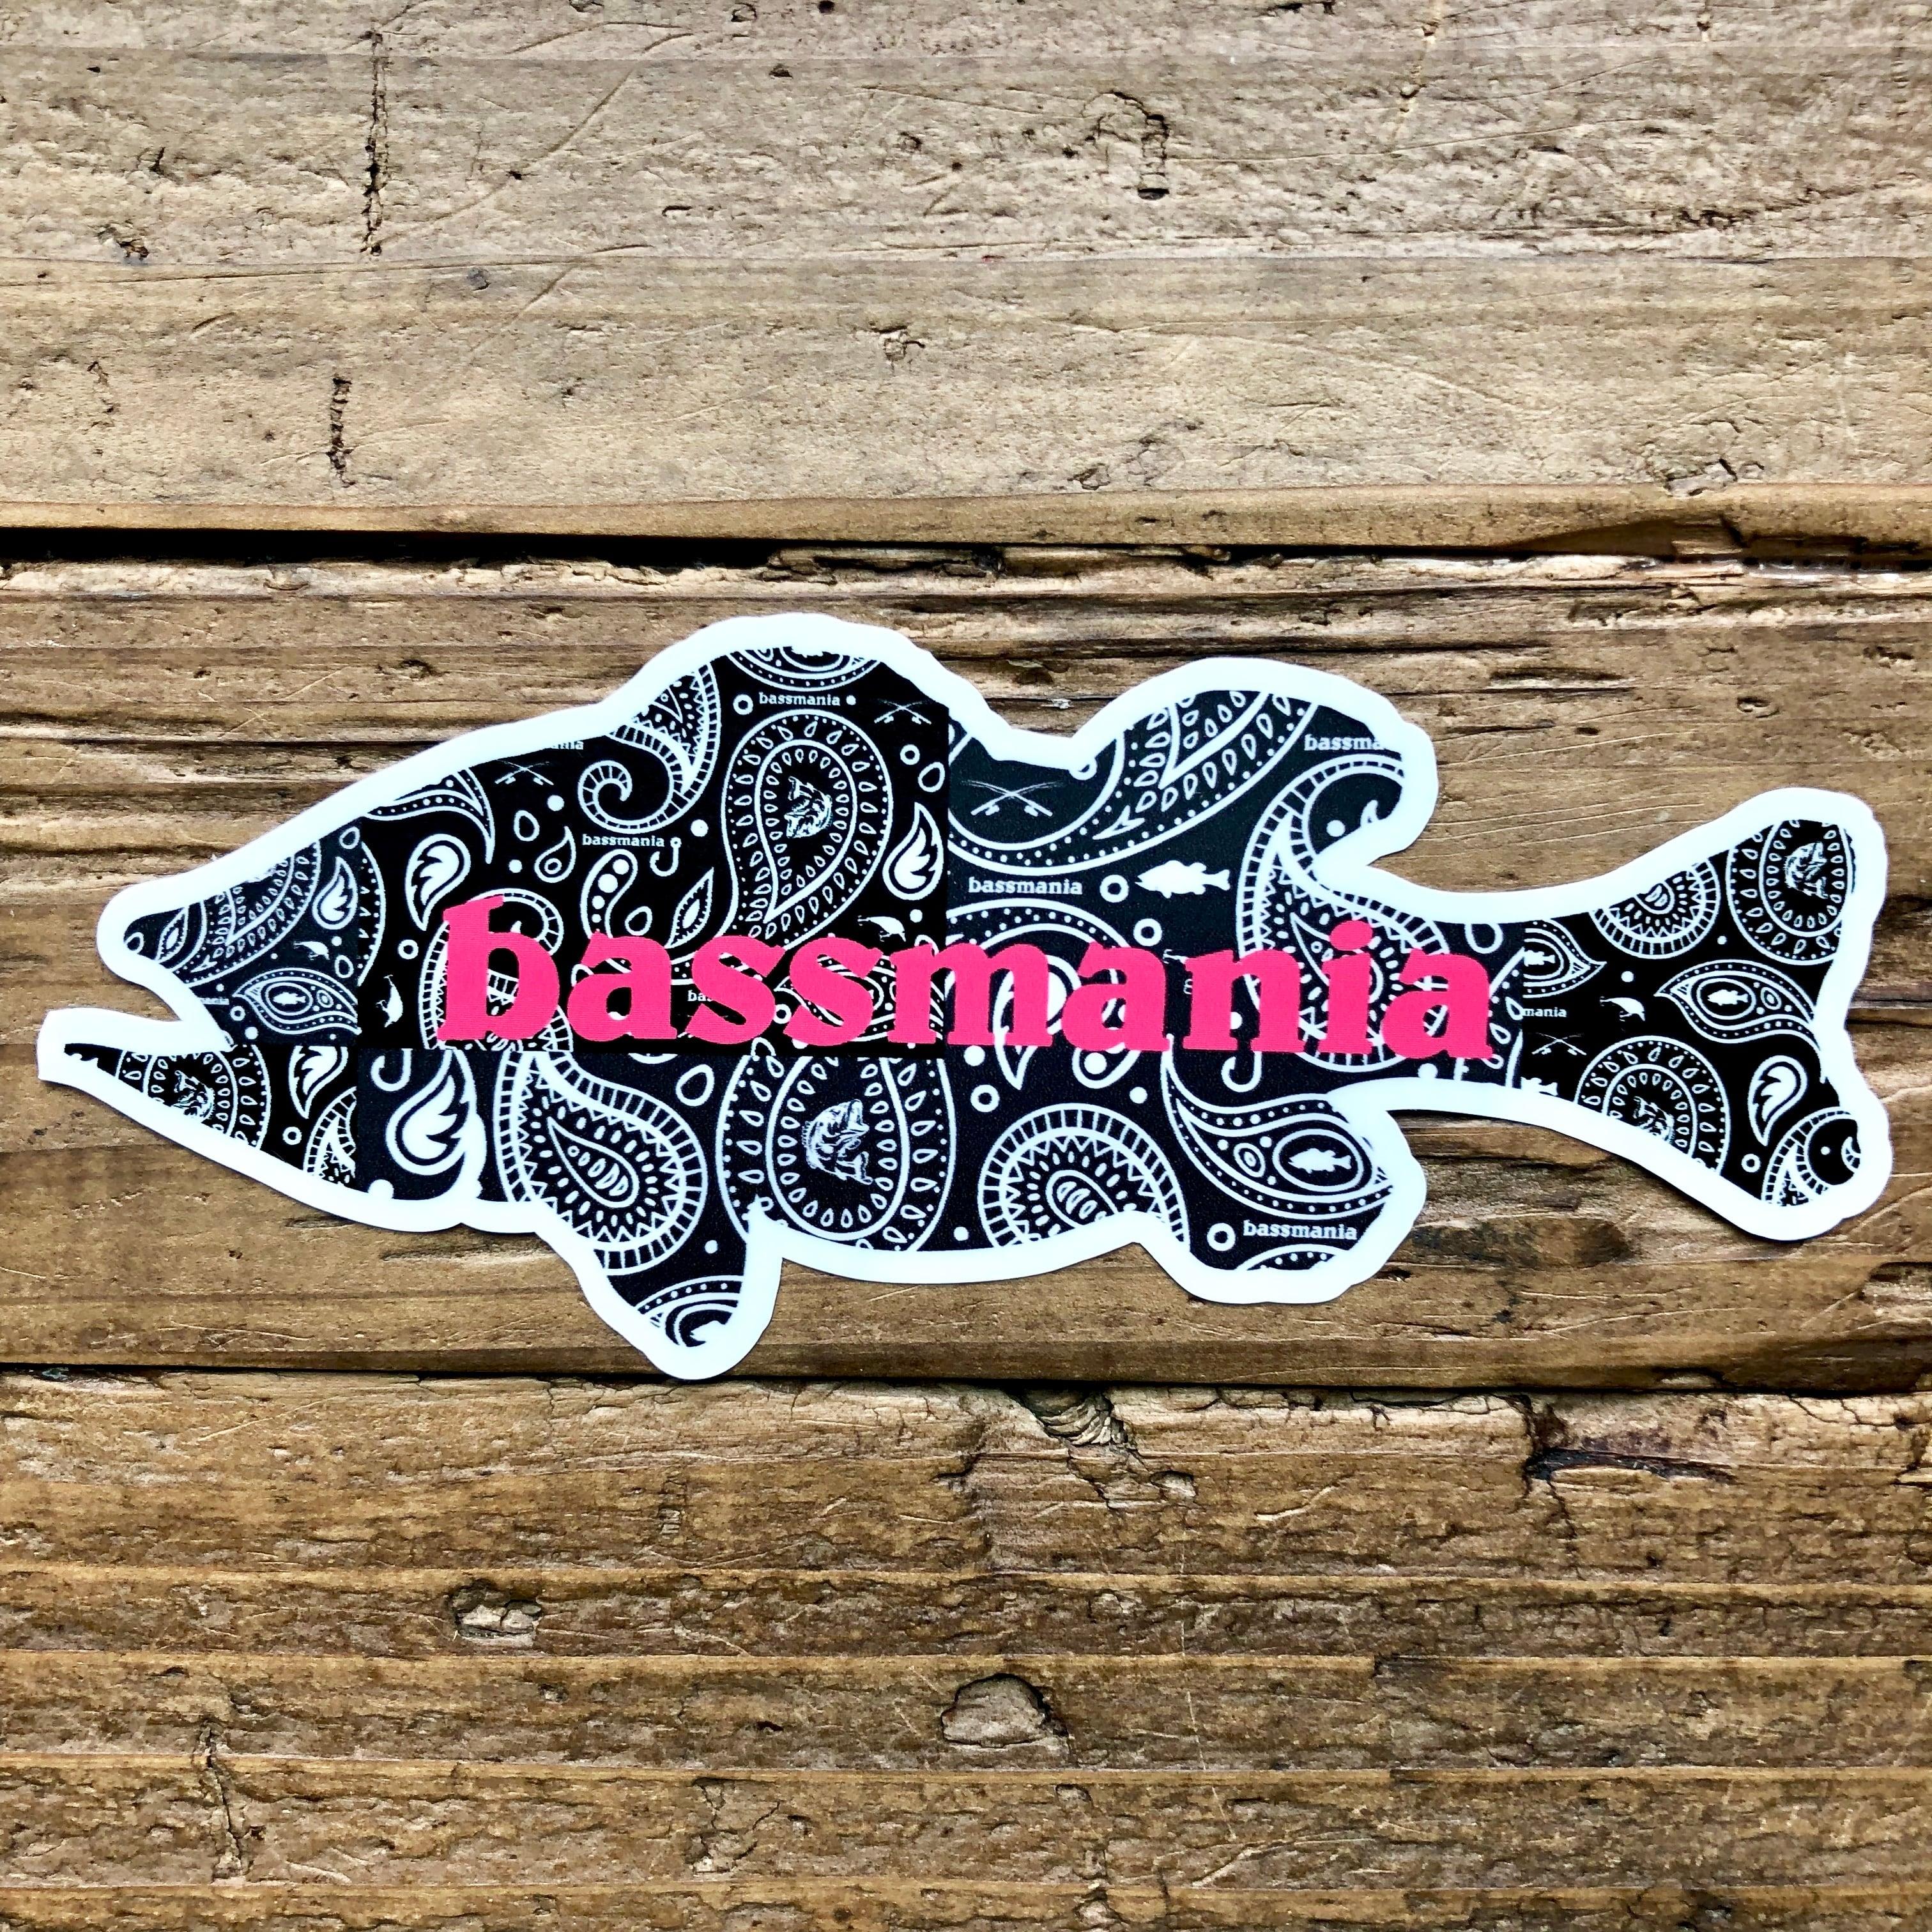 Paisley bass sticker